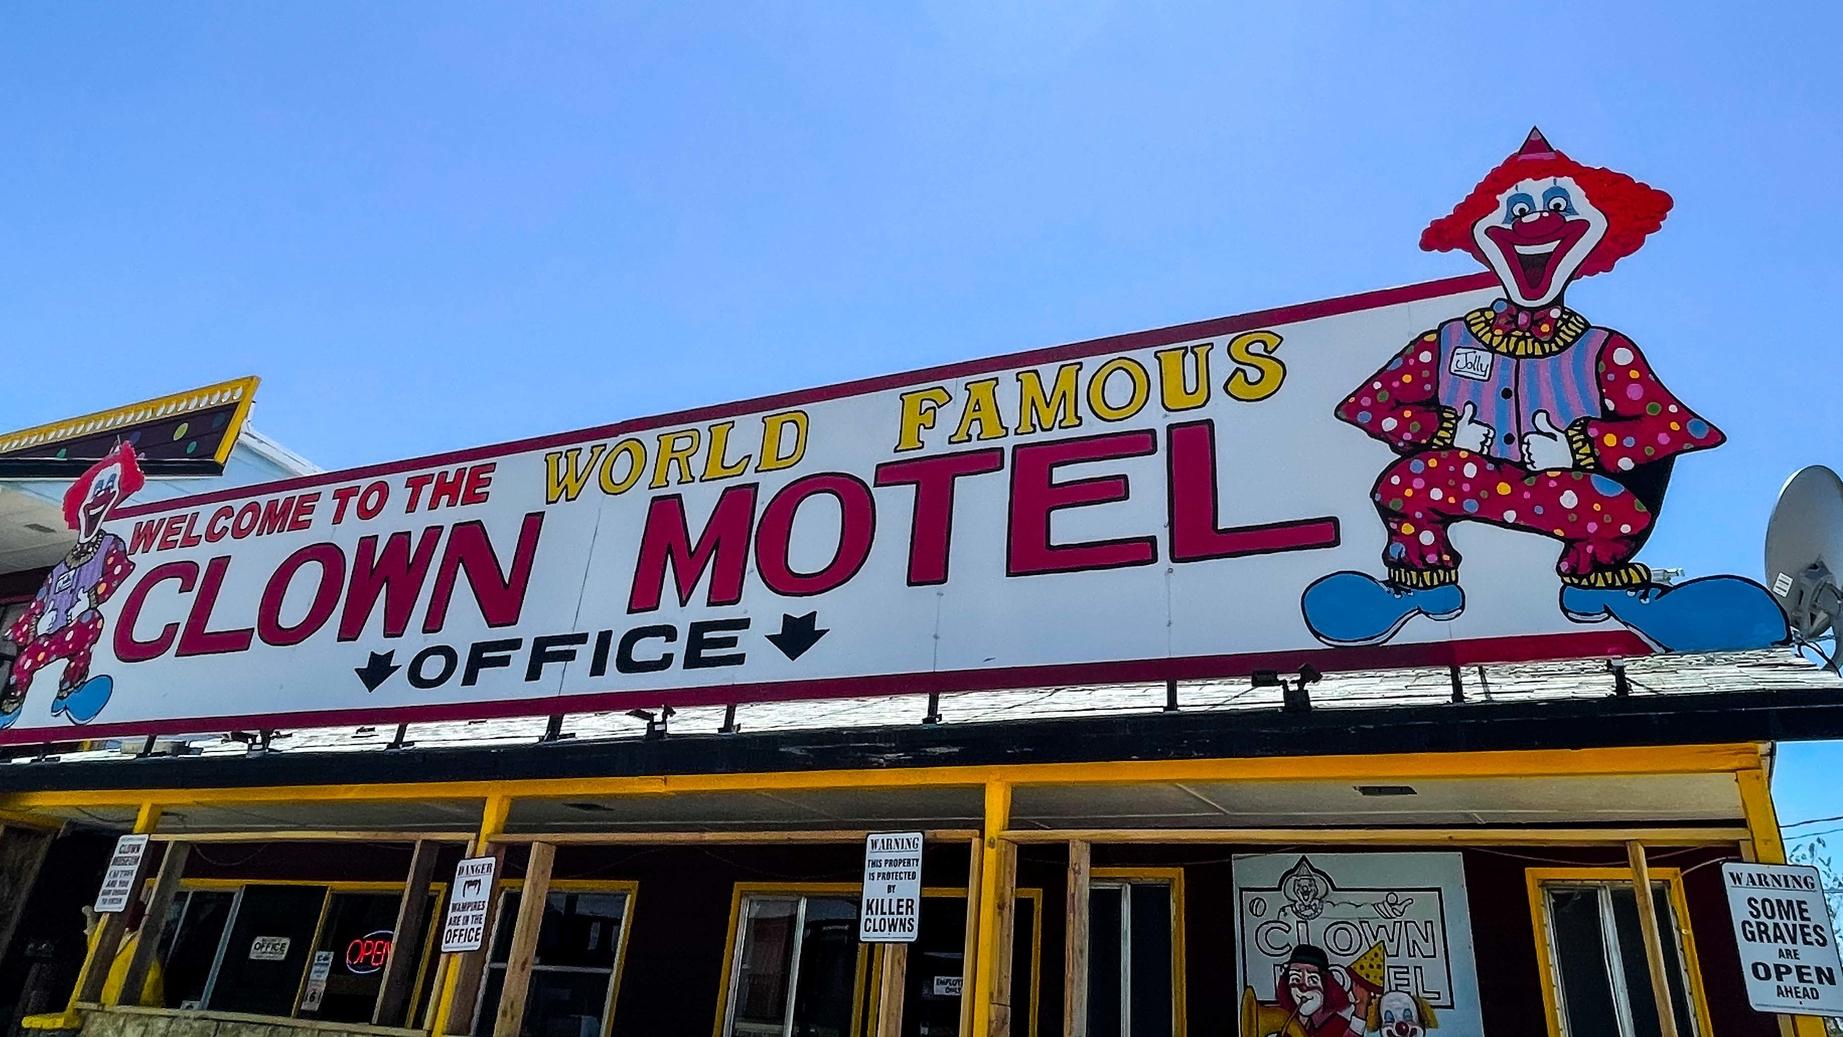 Clown Motel Ghost Hunt  Tonopah, Nevada  Friday November 19th 2021